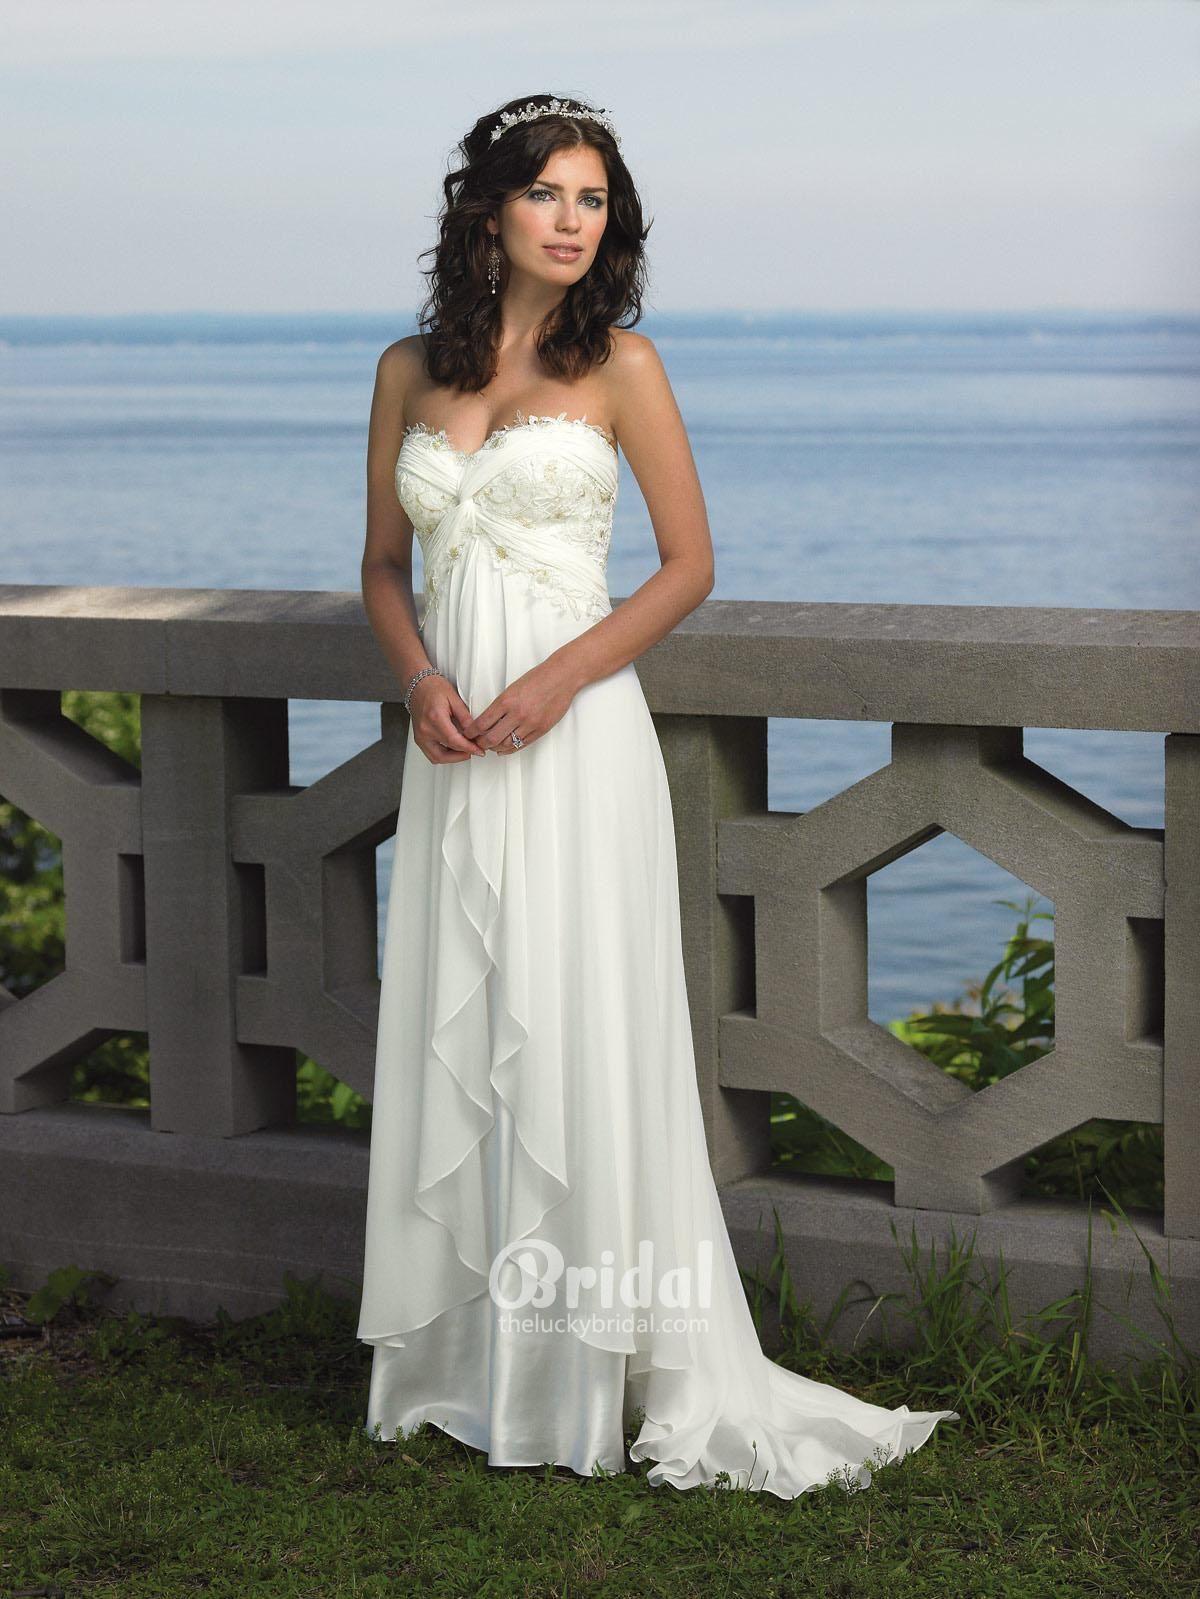 Empire Waist Beach Wedding Dress With Strapless Sweetheart Neckline And Ruffled Hem Wedding Dresses Wedding Gowns Lace Simple Wedding Dress Beach [ 1599 x 1200 Pixel ]